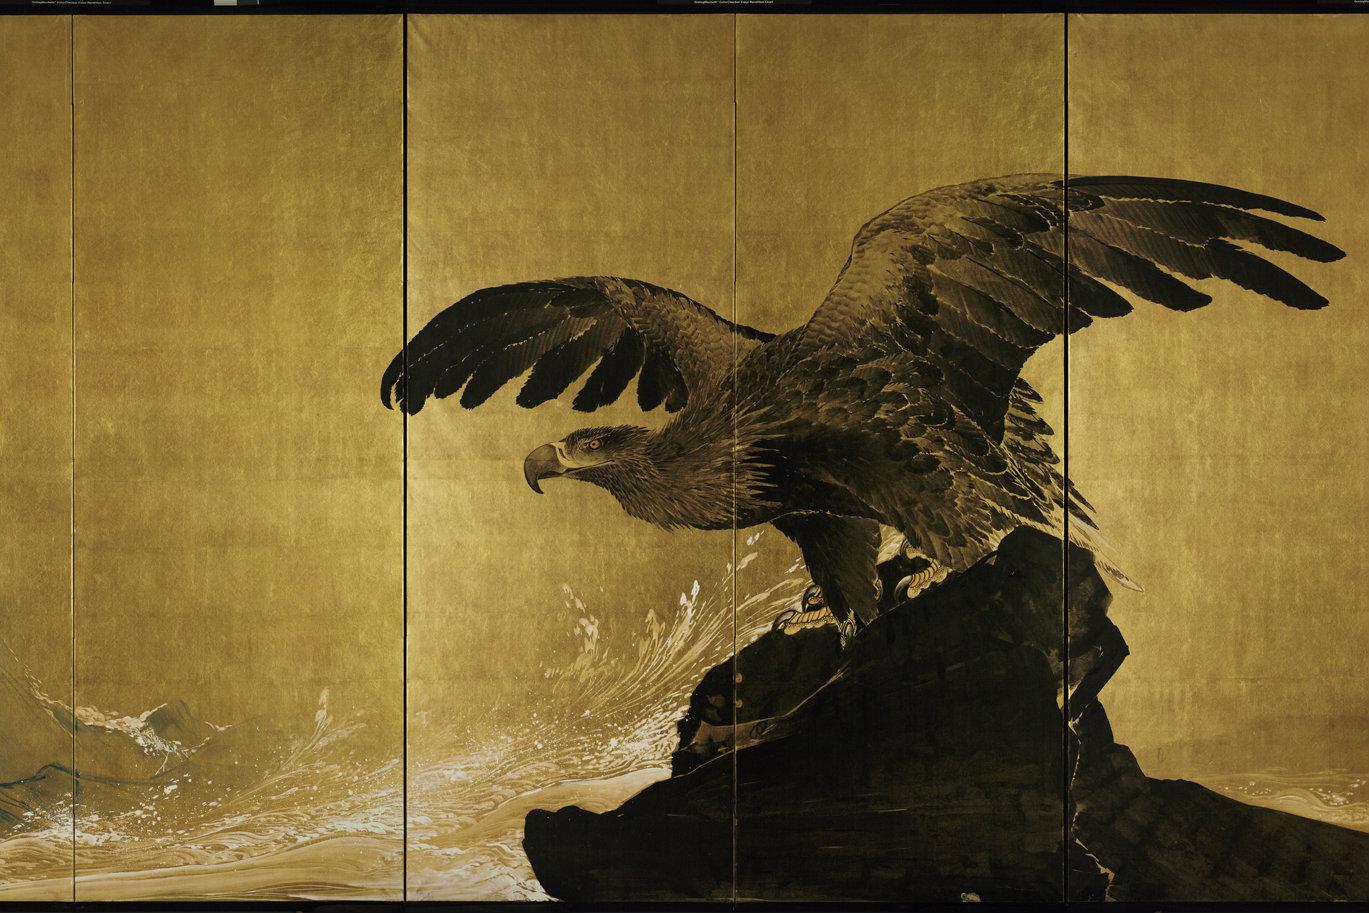 Photo: Sound of Waves by Tsuji Kakō.